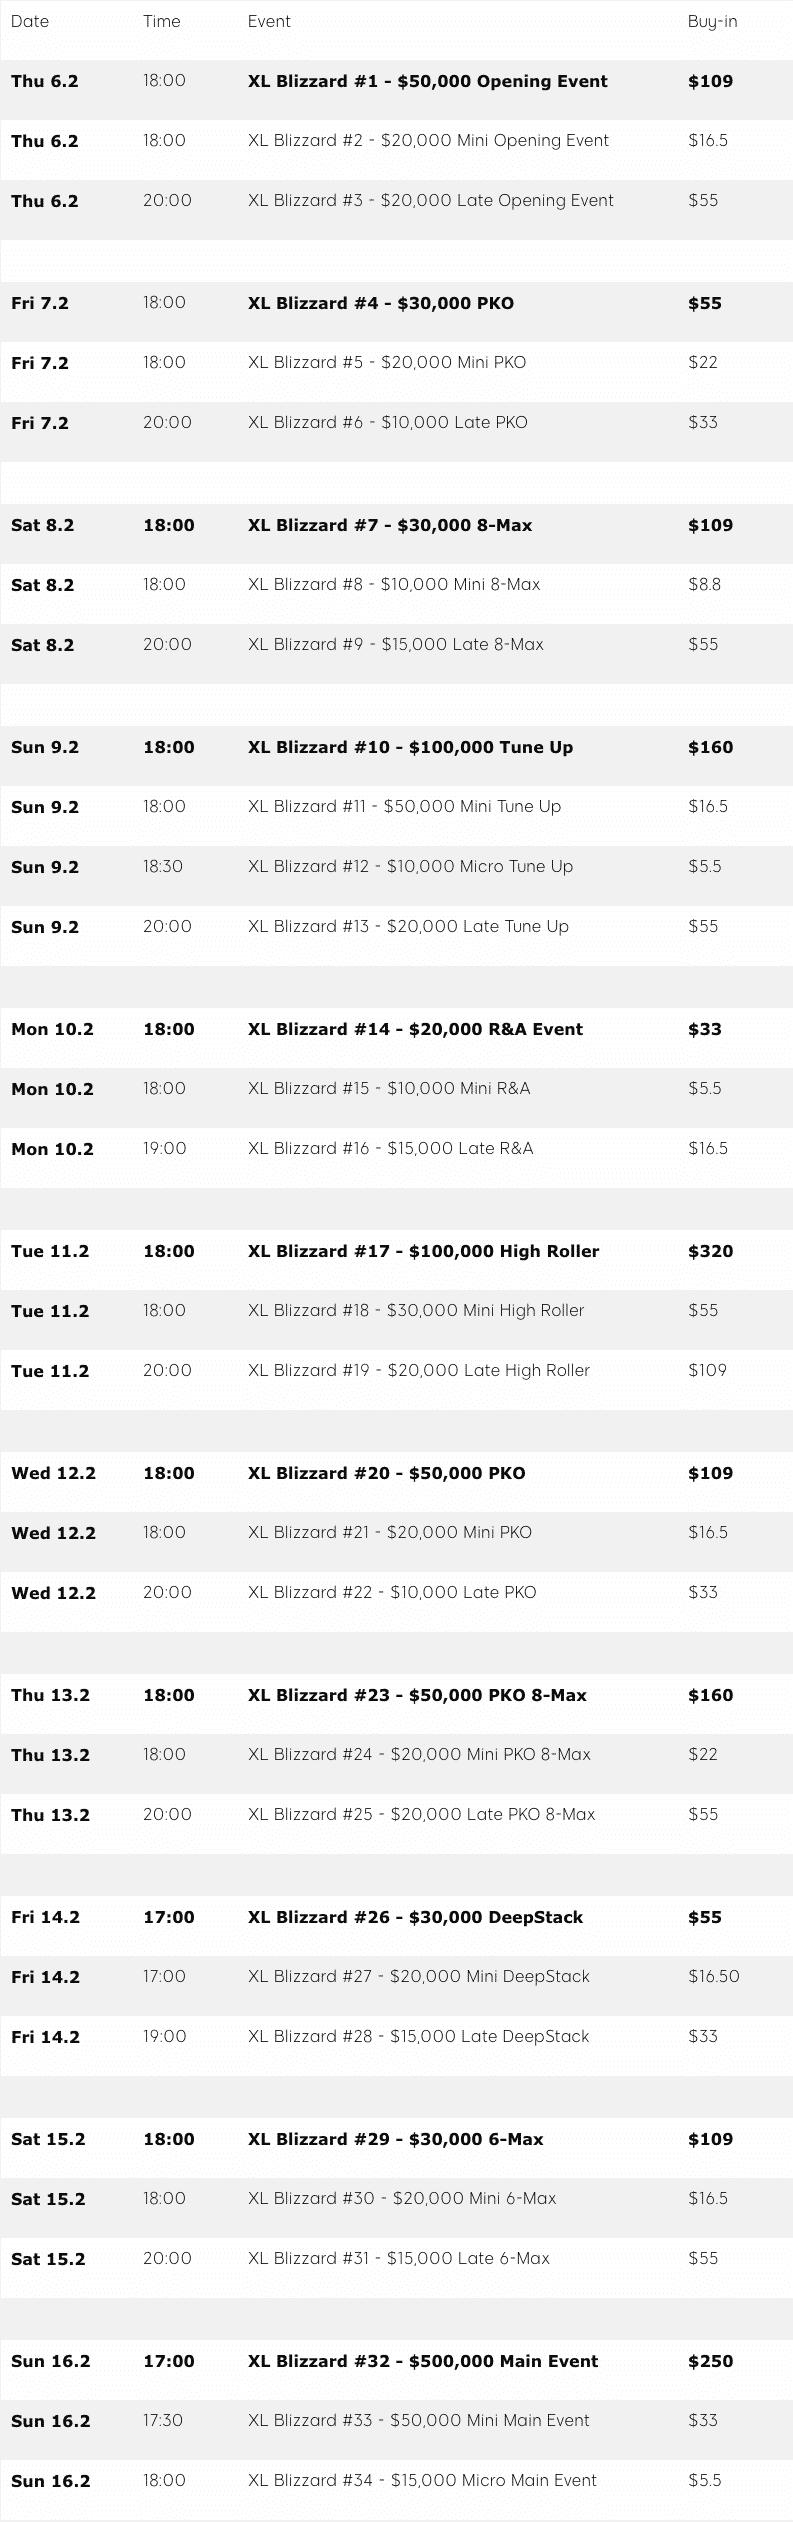 Расписание XL Blizzard 2020